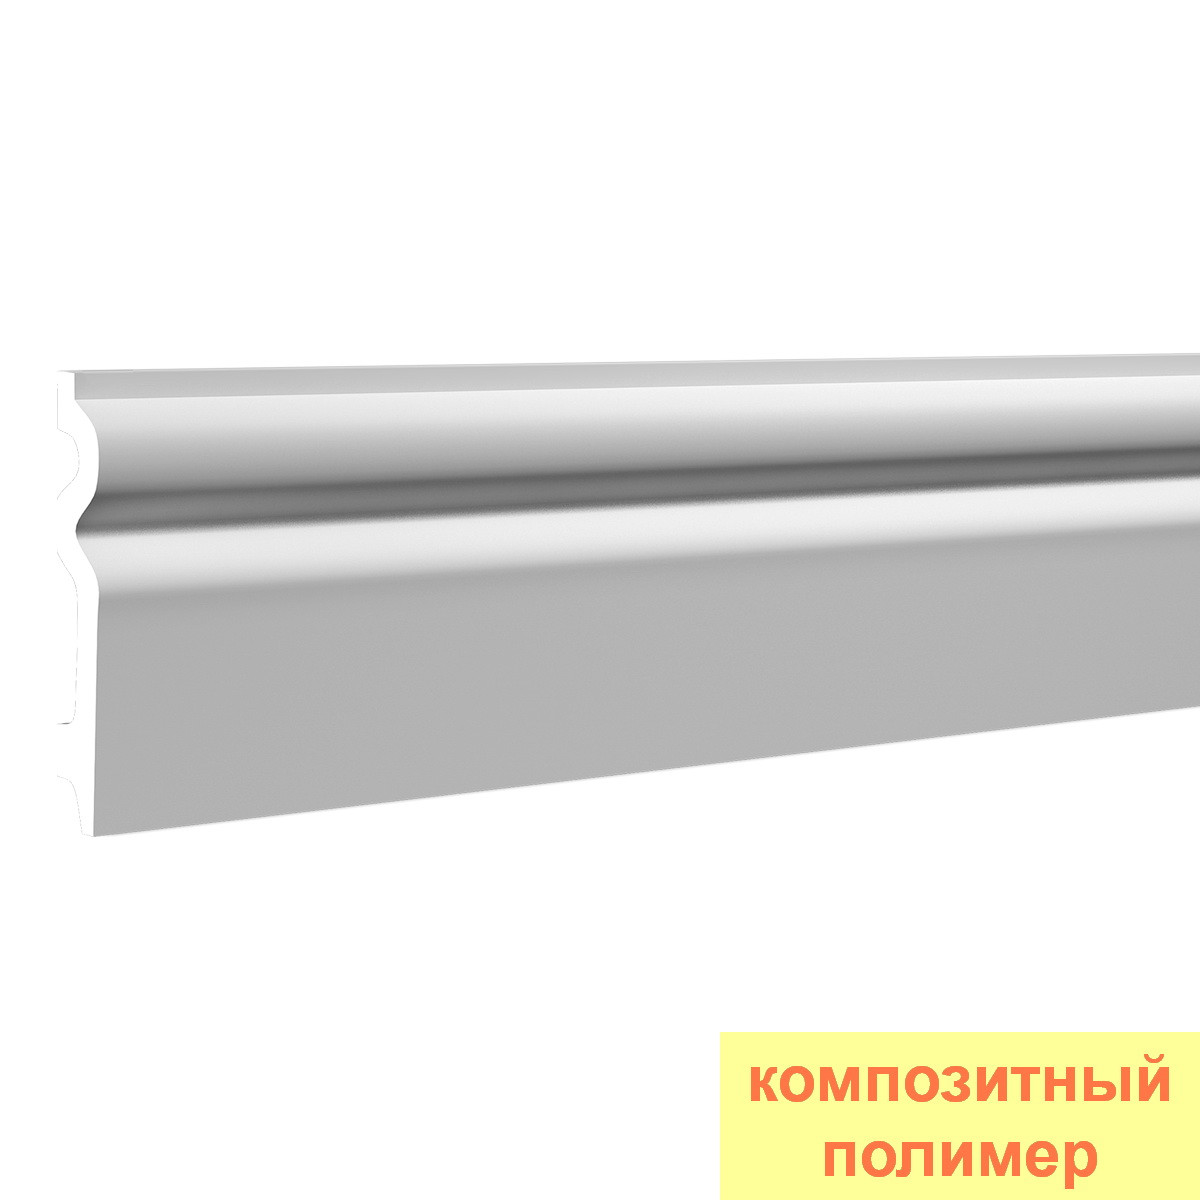 Плинтус Европласт 6.53.109 (98х16)мм